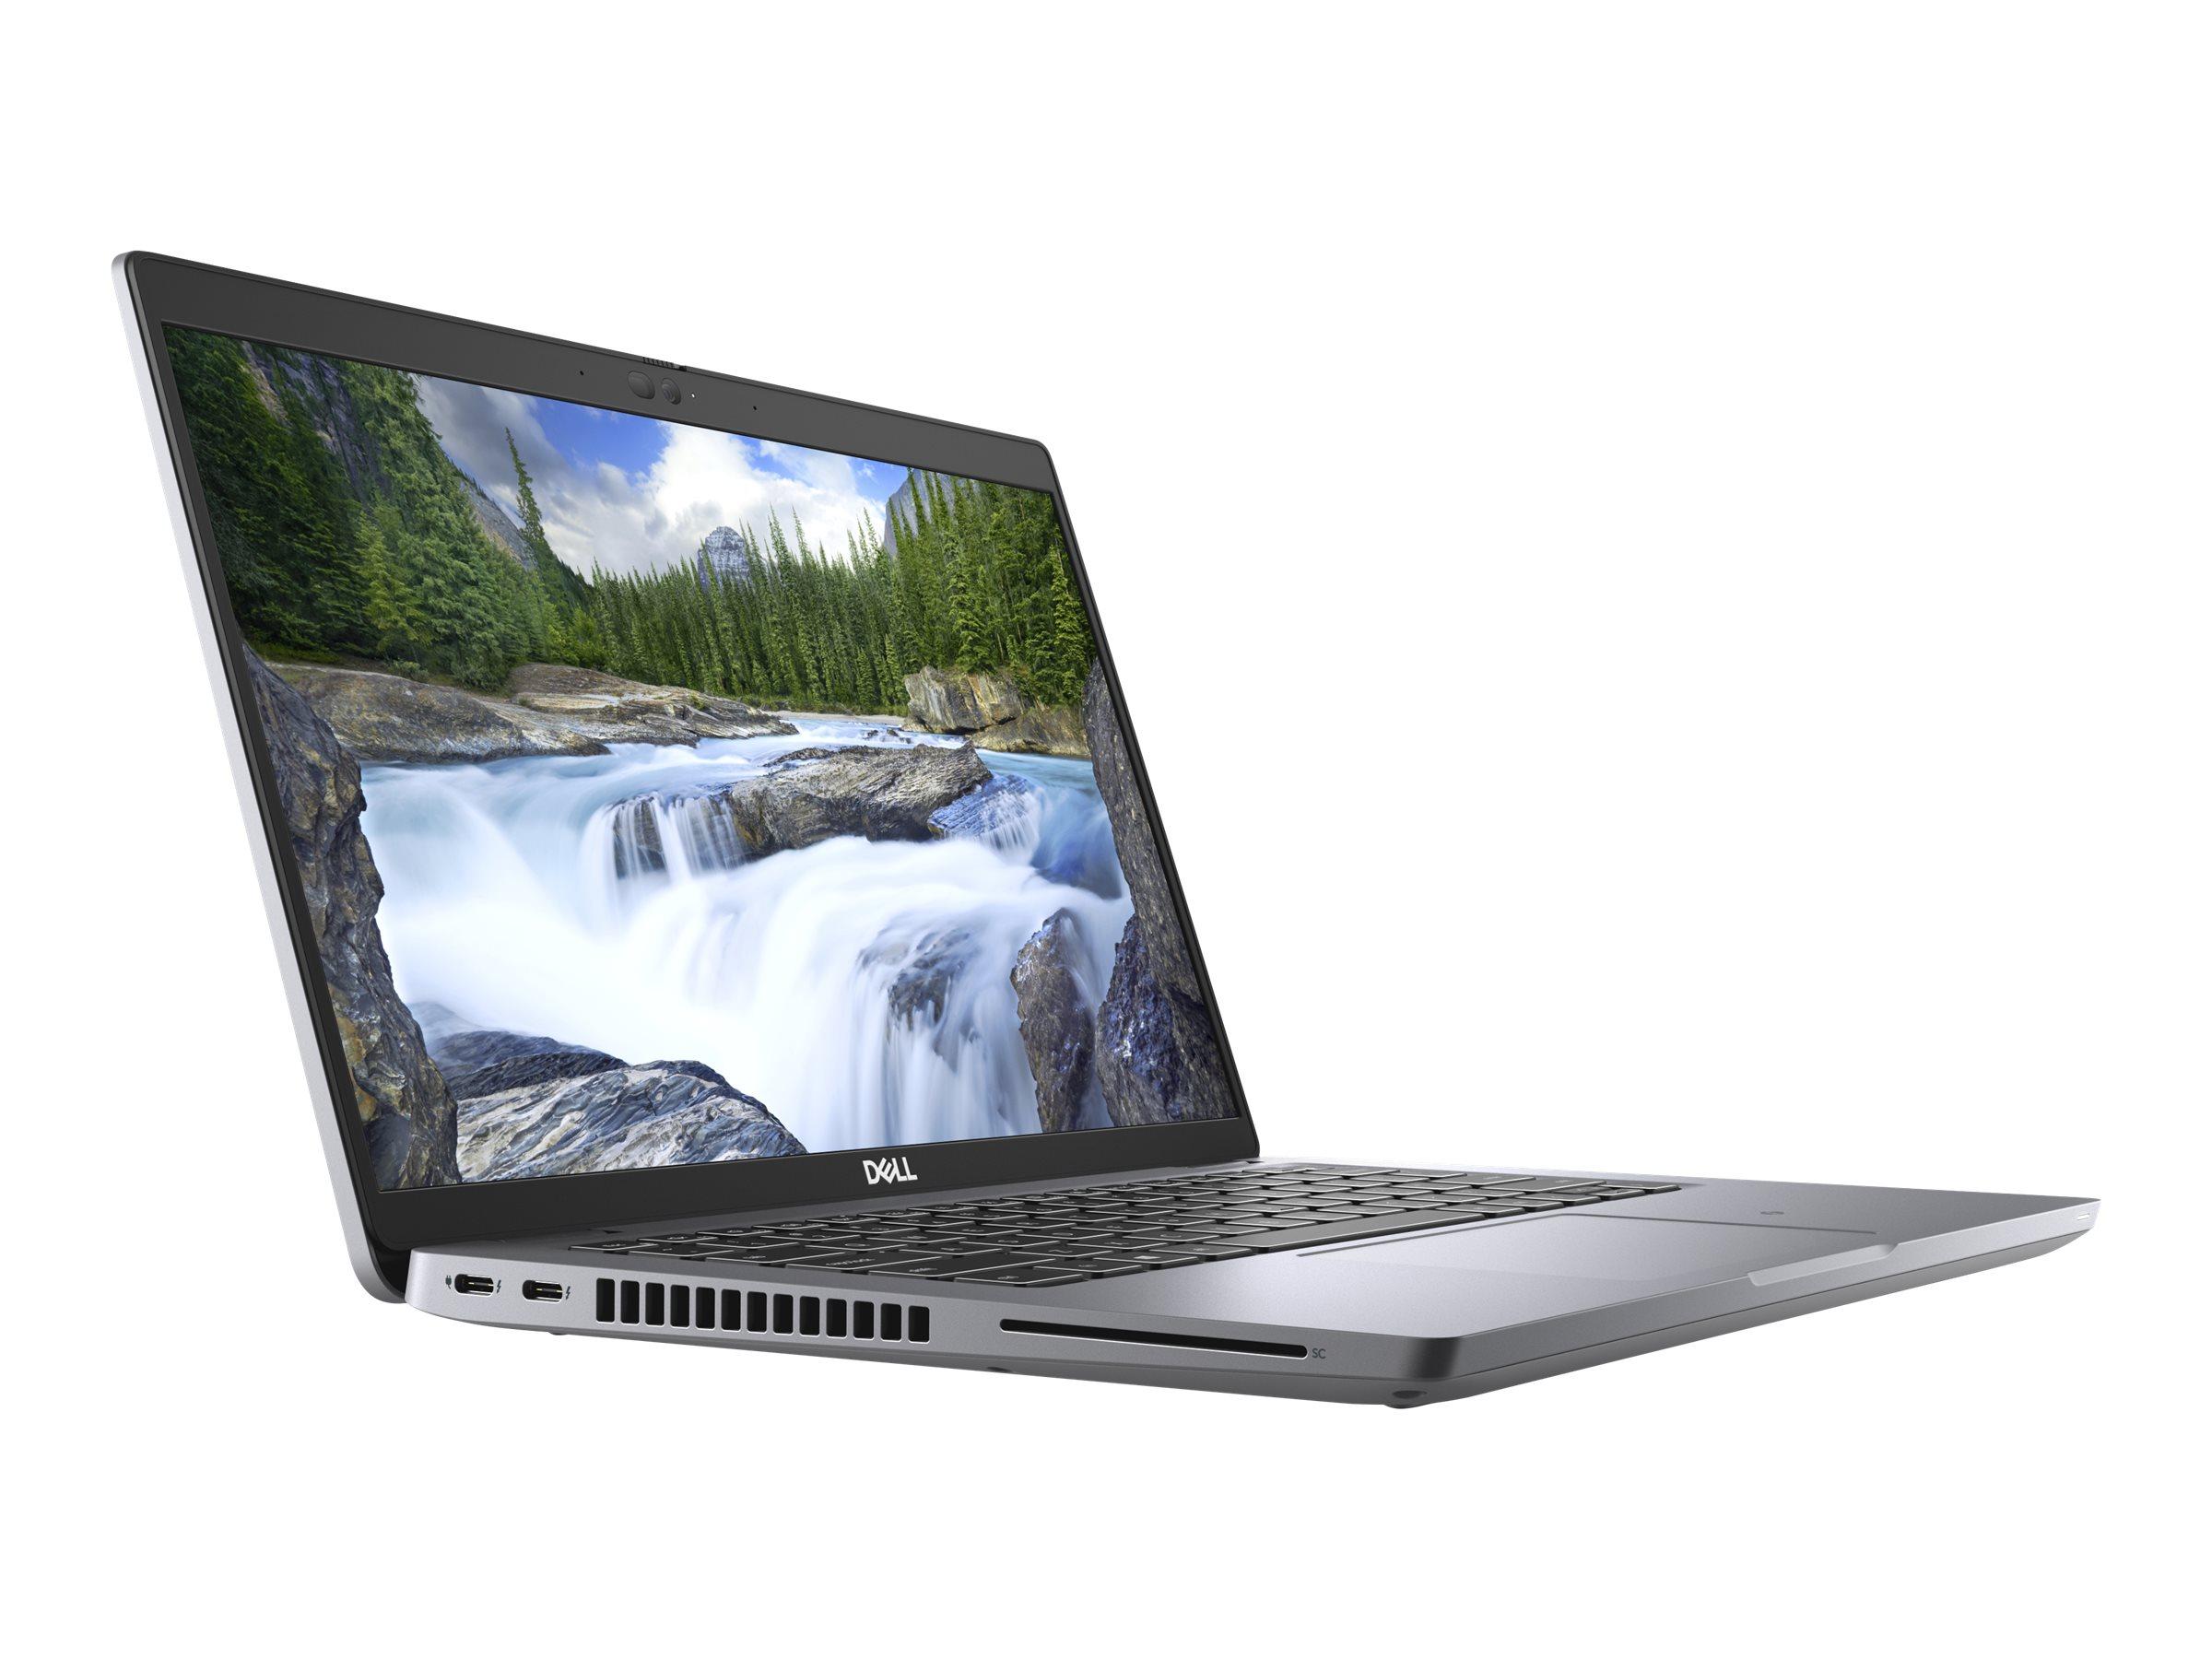 Dell Latitude 5420 - Core i5 1145G7 / 2.6 GHz - vPro - Win 10 Pro 64-Bit - 16 GB RAM - 256 GB SSD NVMe